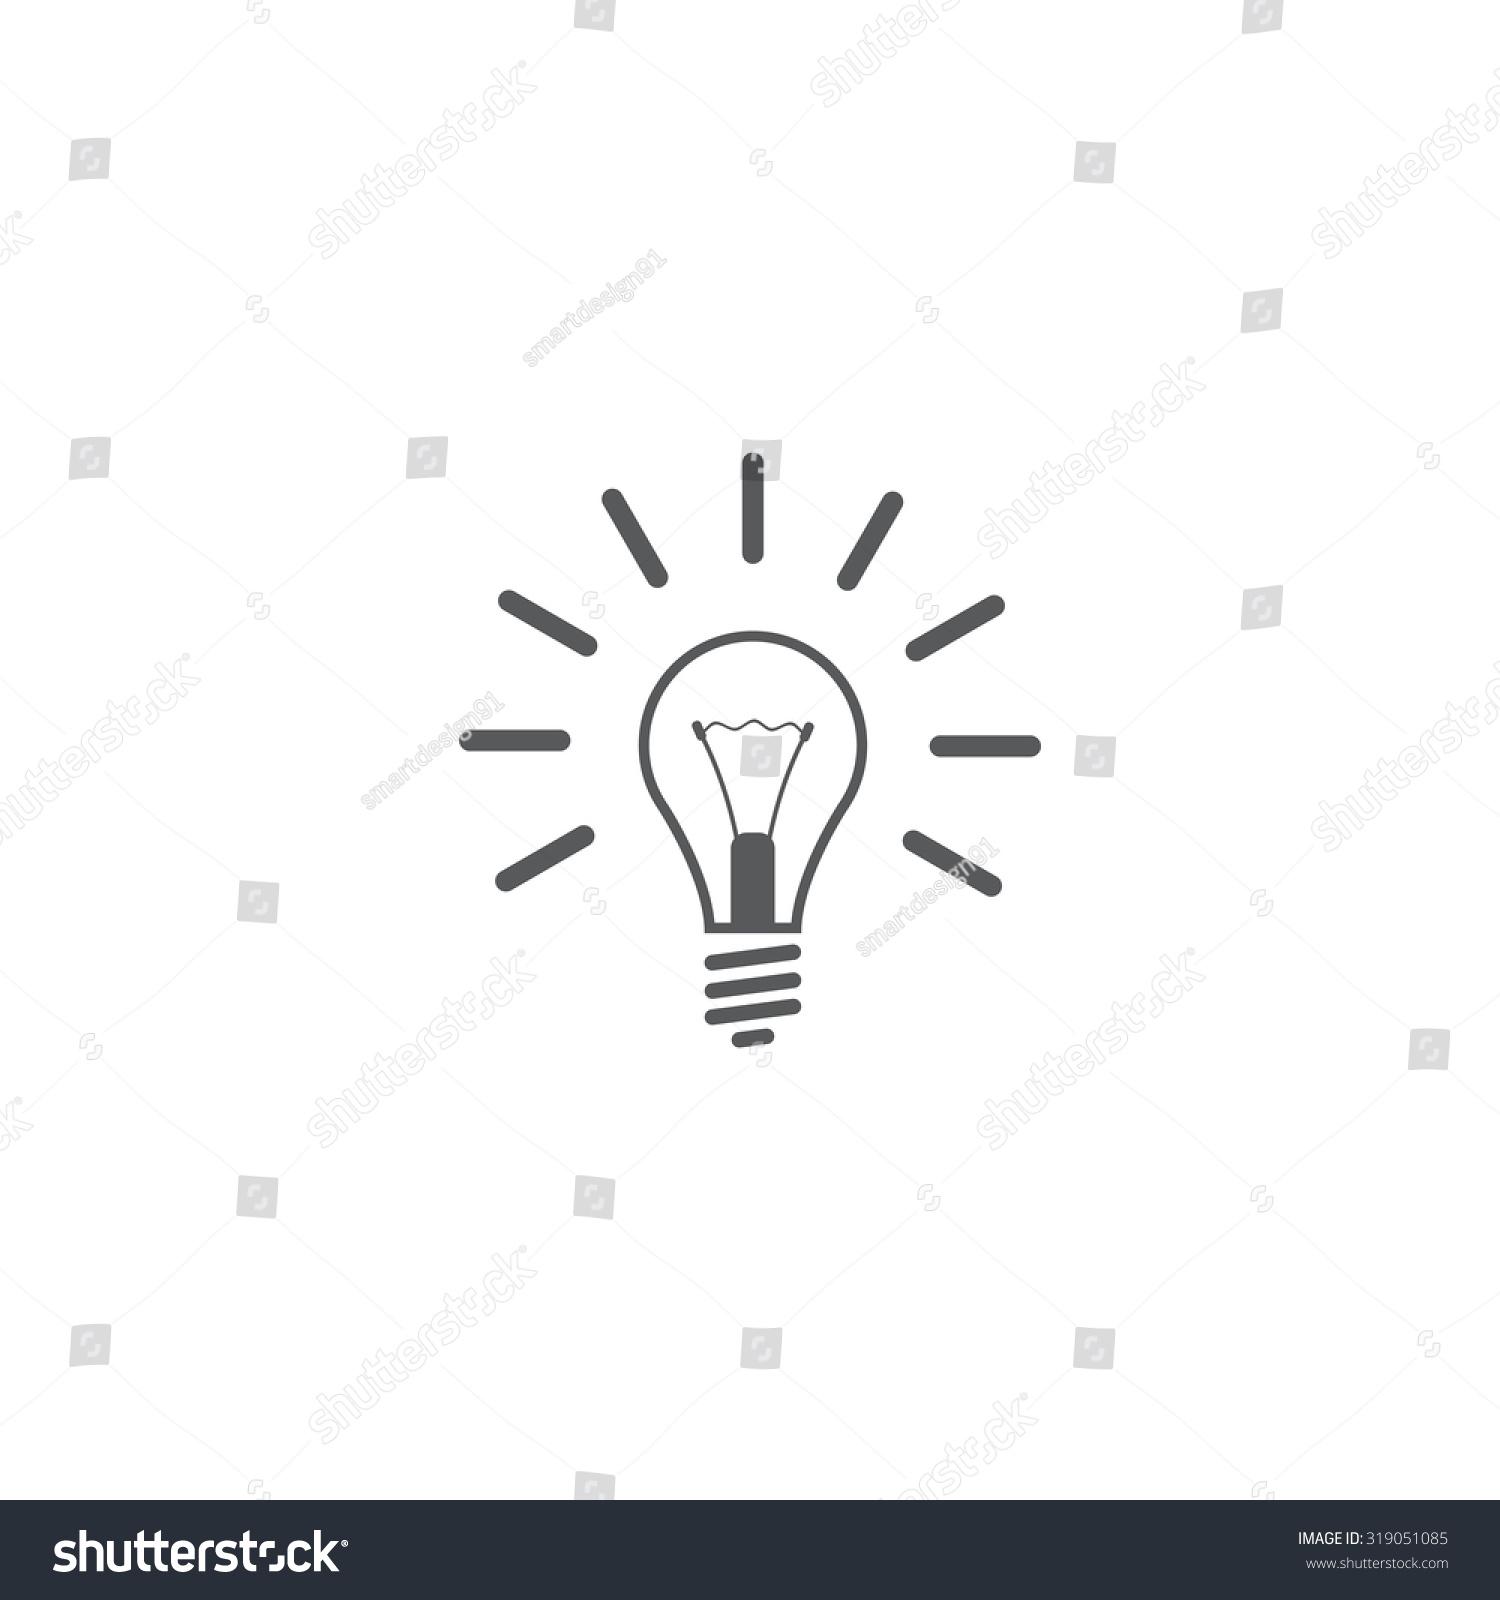 Gemütlich Spulenkreis Symbol Ideen - Elektrische Schaltplan-Ideen ...